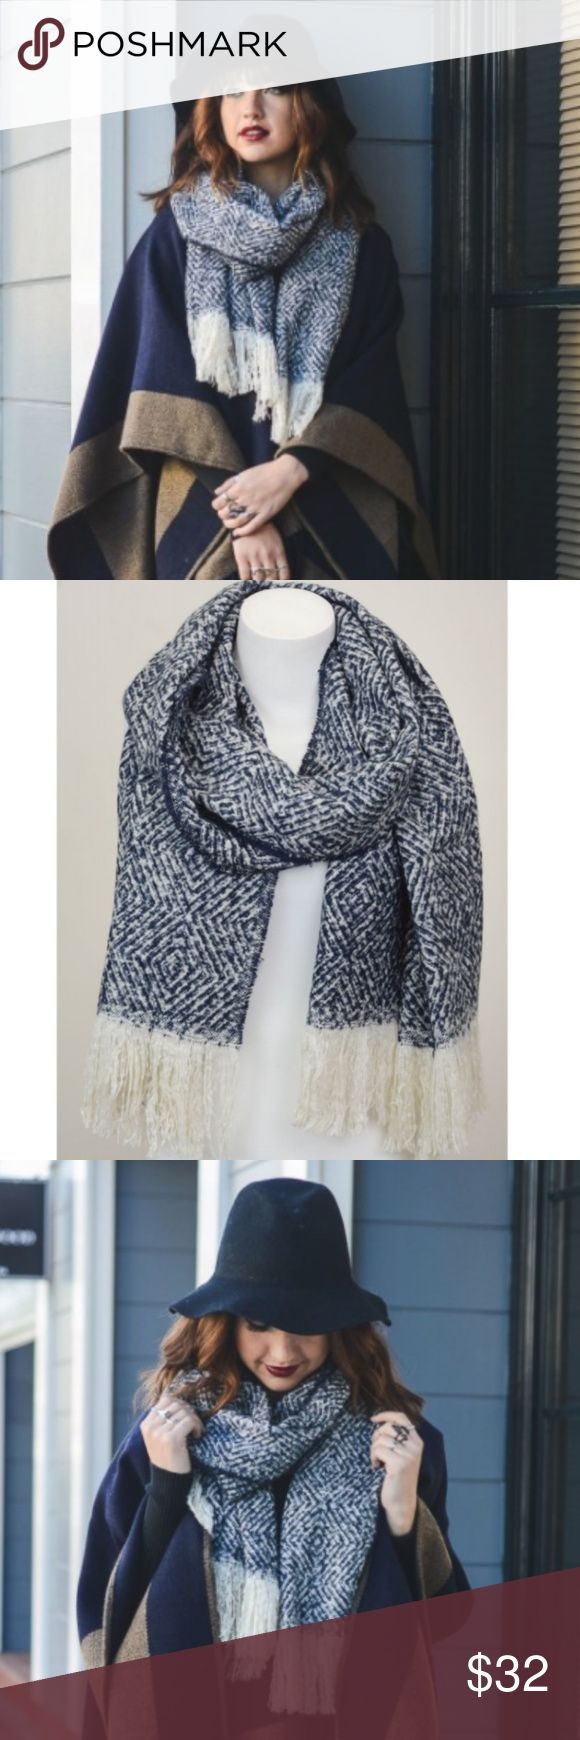 "Navy Tassel Scarf Diamond print navy blue  scarf with ivory tassle trim. Price firm unless bundled. No trades.  100% Acrylic Dimension 76""x23"" Accessories Scarves & Wraps"